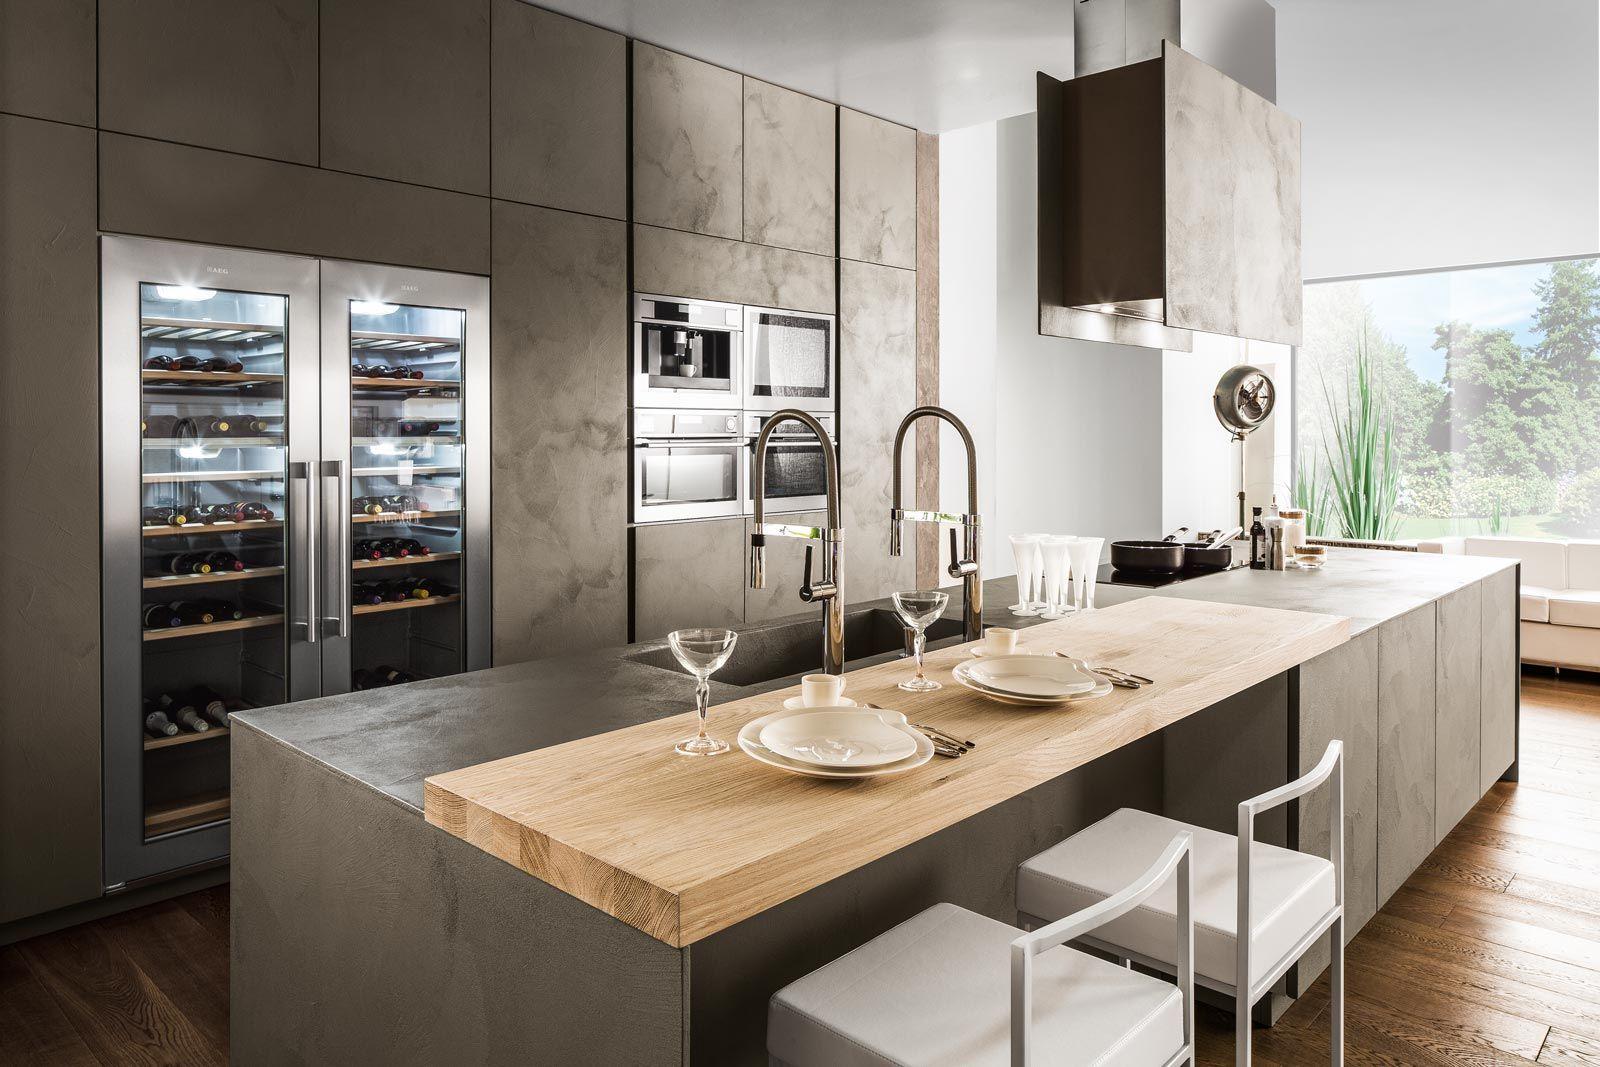 Eurocucina 2016: superfici soft touch per le nuove cucine ...